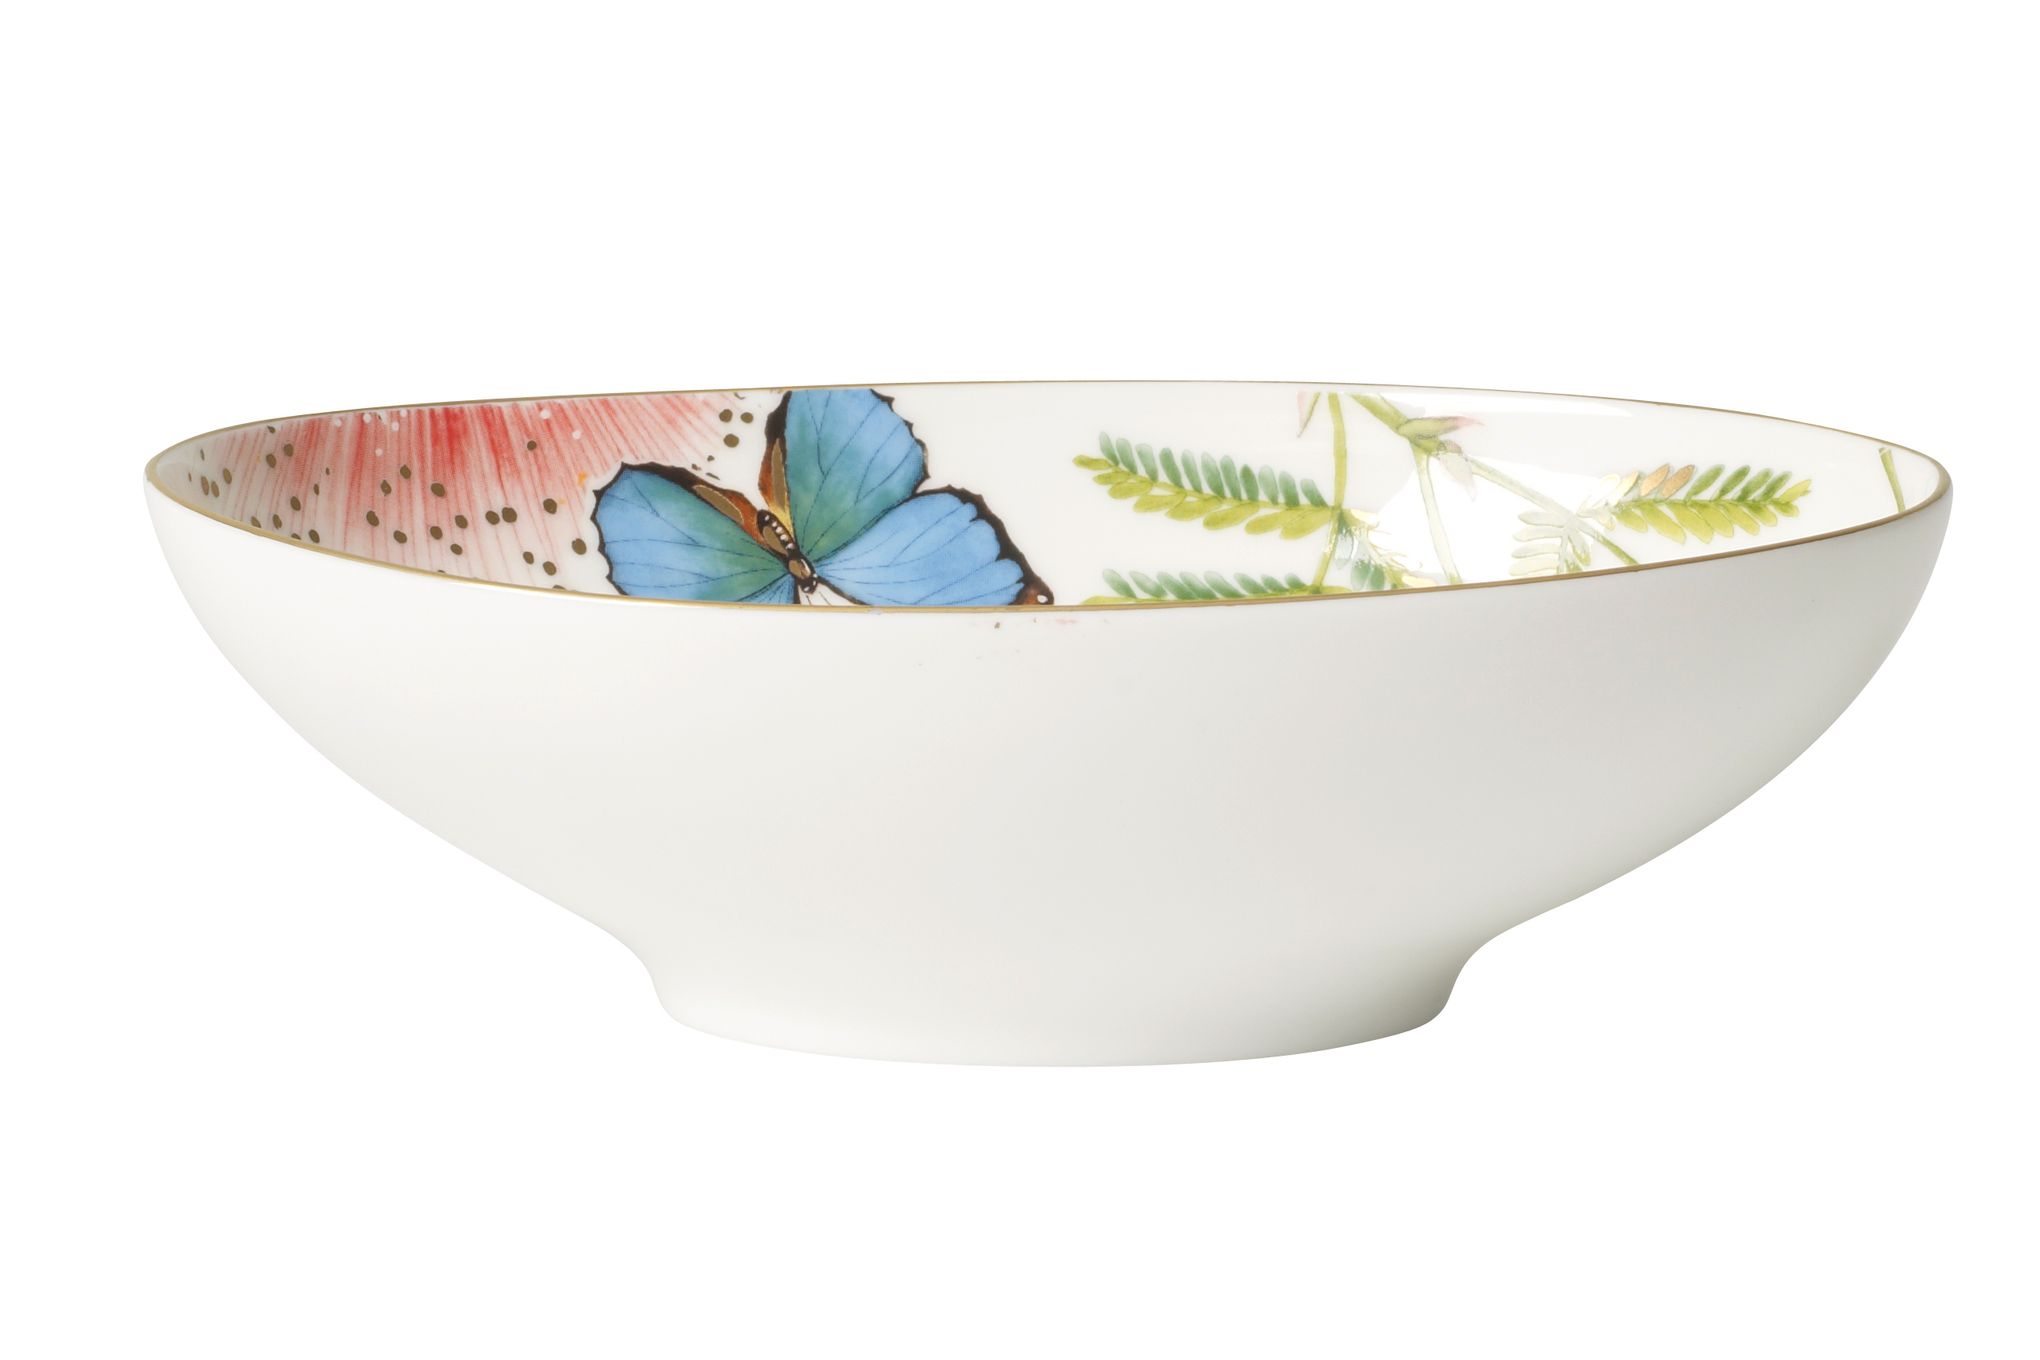 Villeroy & Boch Amazonia Bowl 19 x 12cm thumb 1